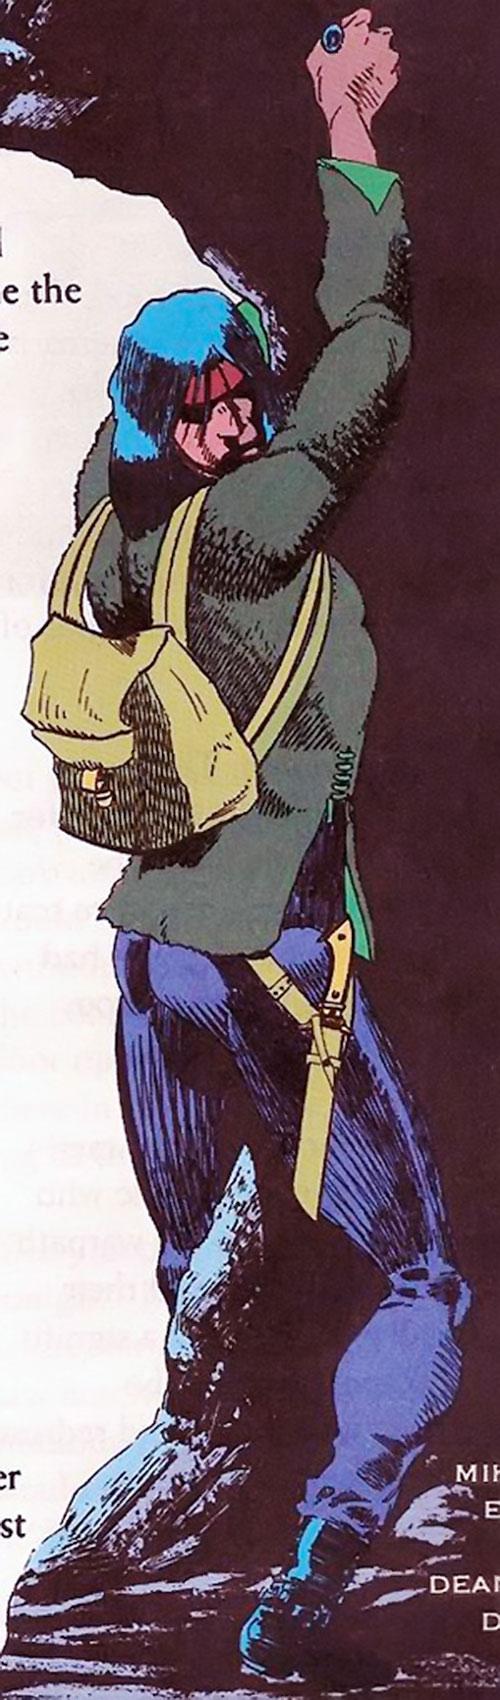 John Butcher (DC Comics) climbing a cliff